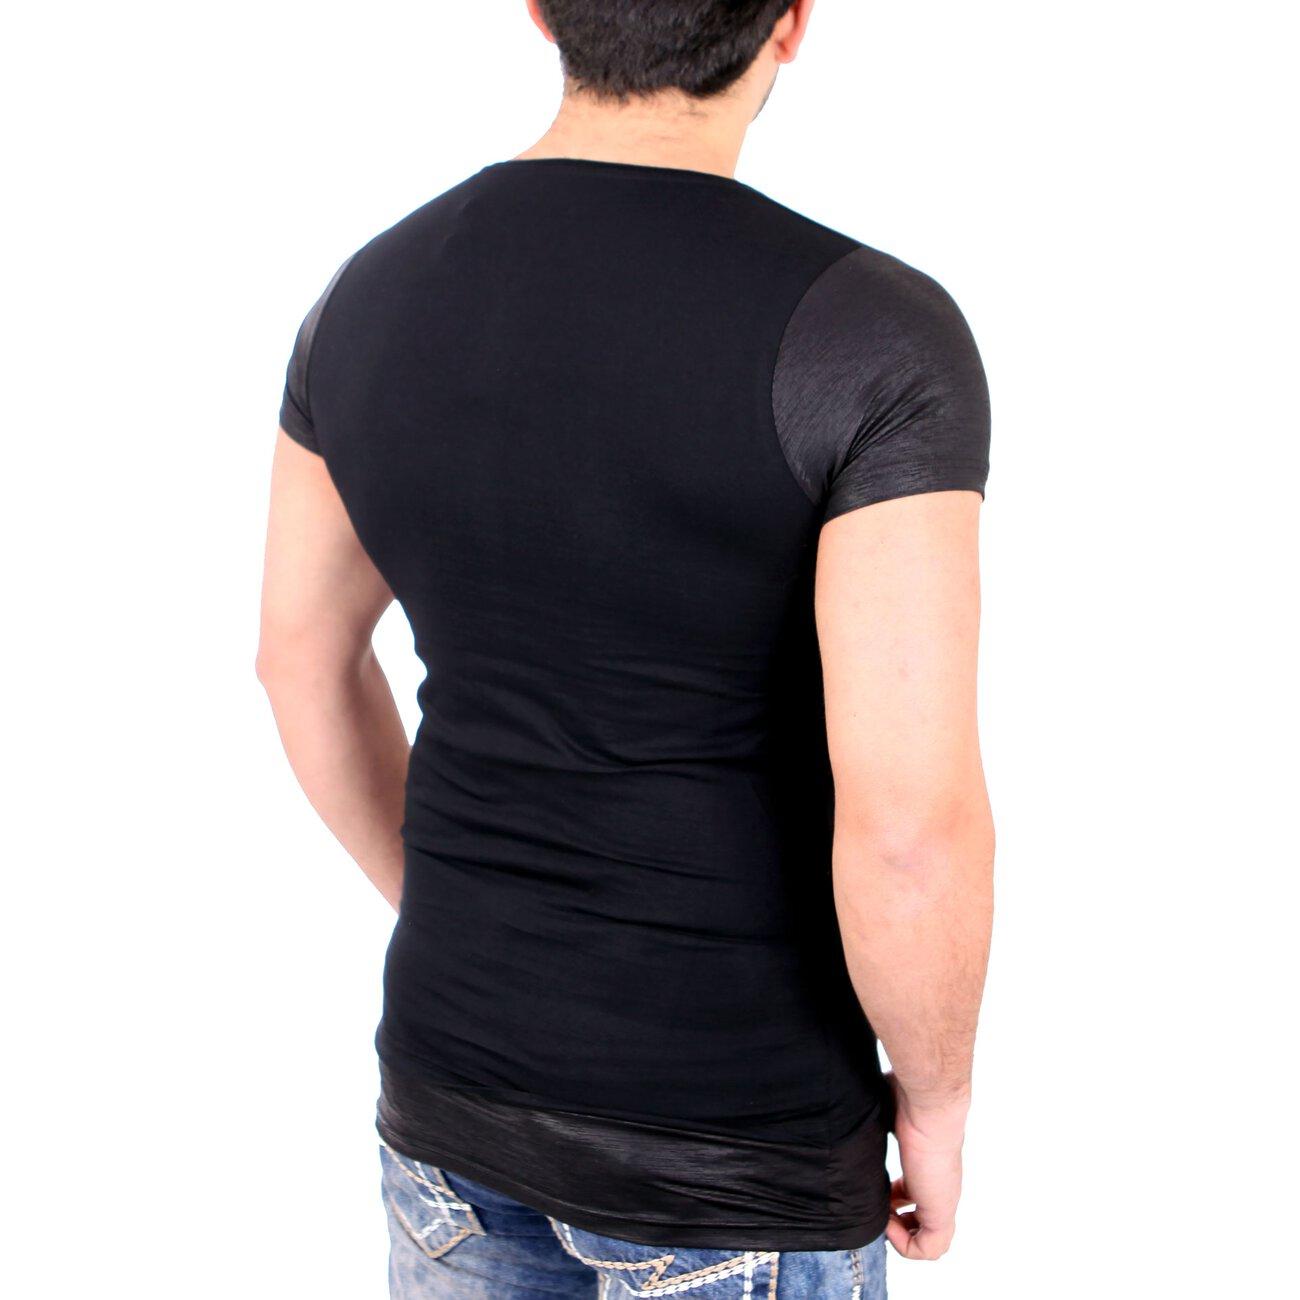 carisma t shirt herren slim fit oversize totenkopf print. Black Bedroom Furniture Sets. Home Design Ideas